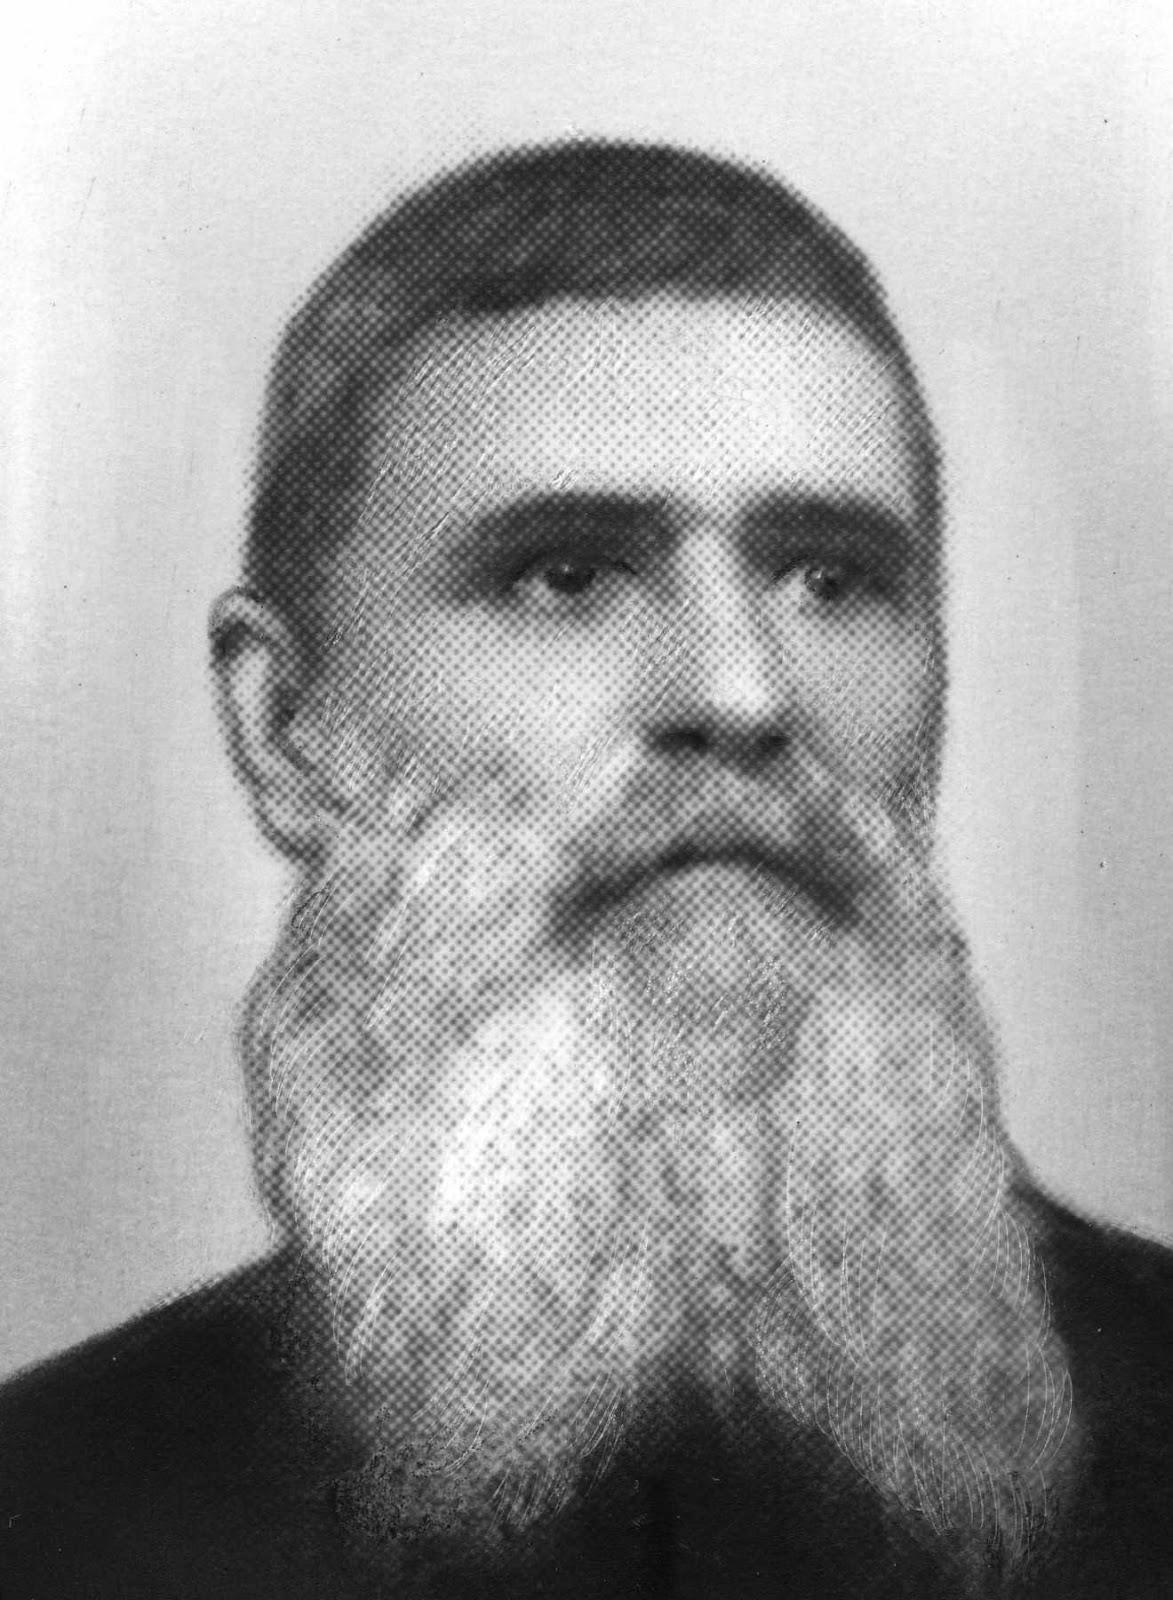 El hermano Antoni Villamassana